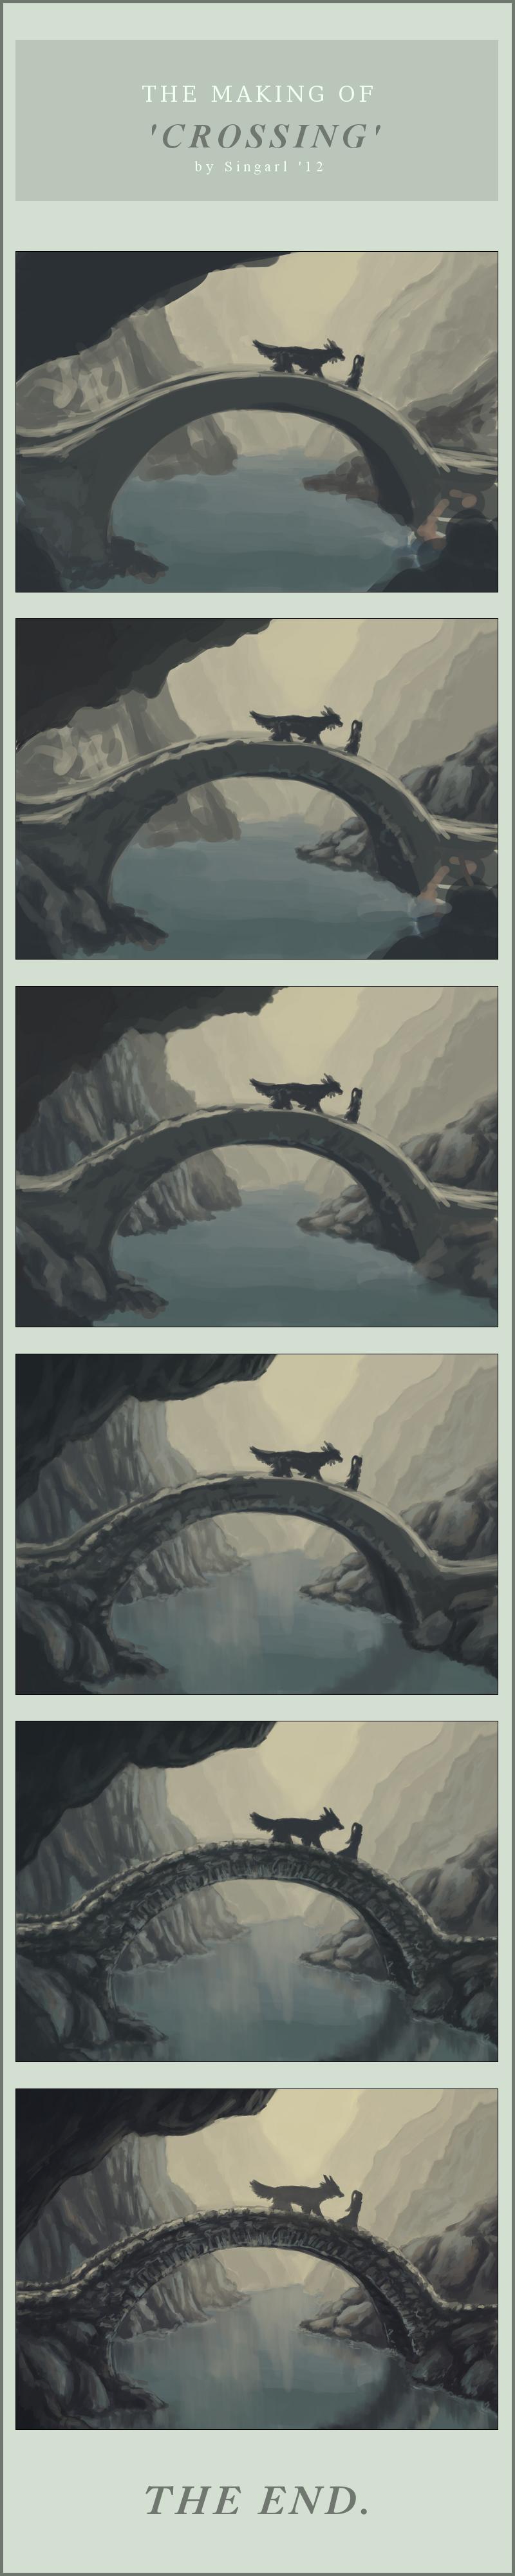 Crossing - Process by Singarl